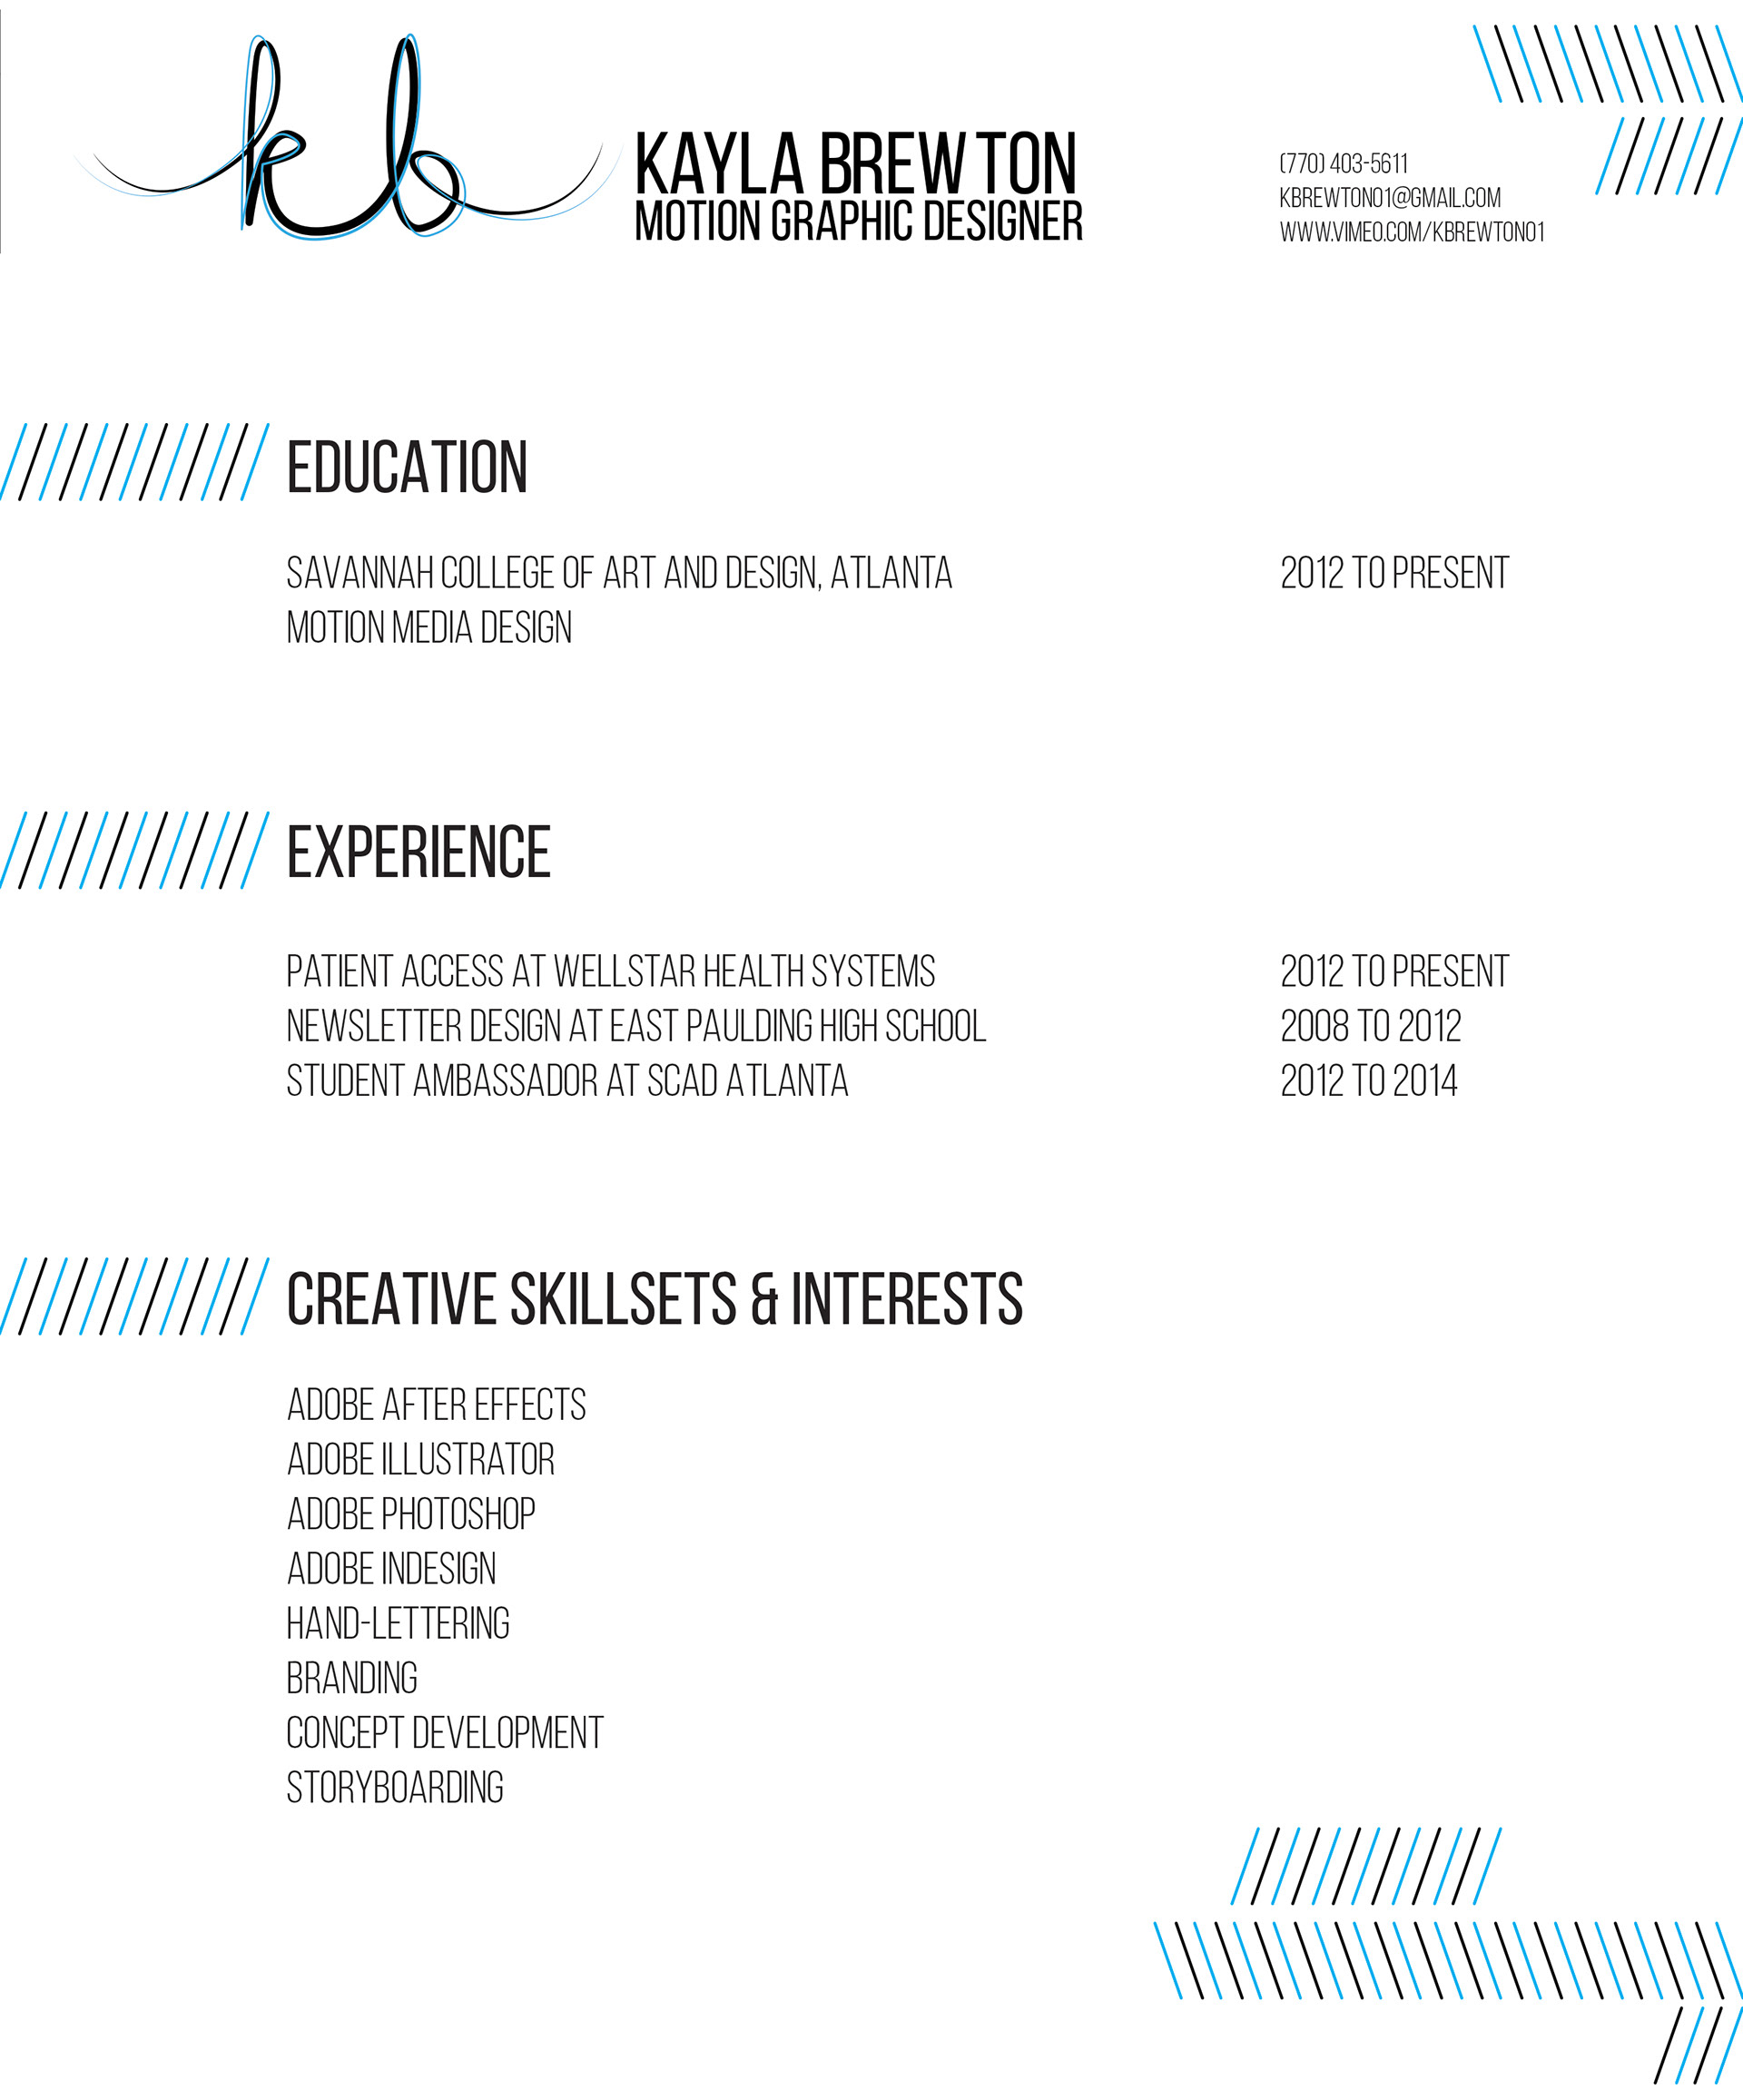 Kayla Brewton | Motion Graphics Designer - Resume